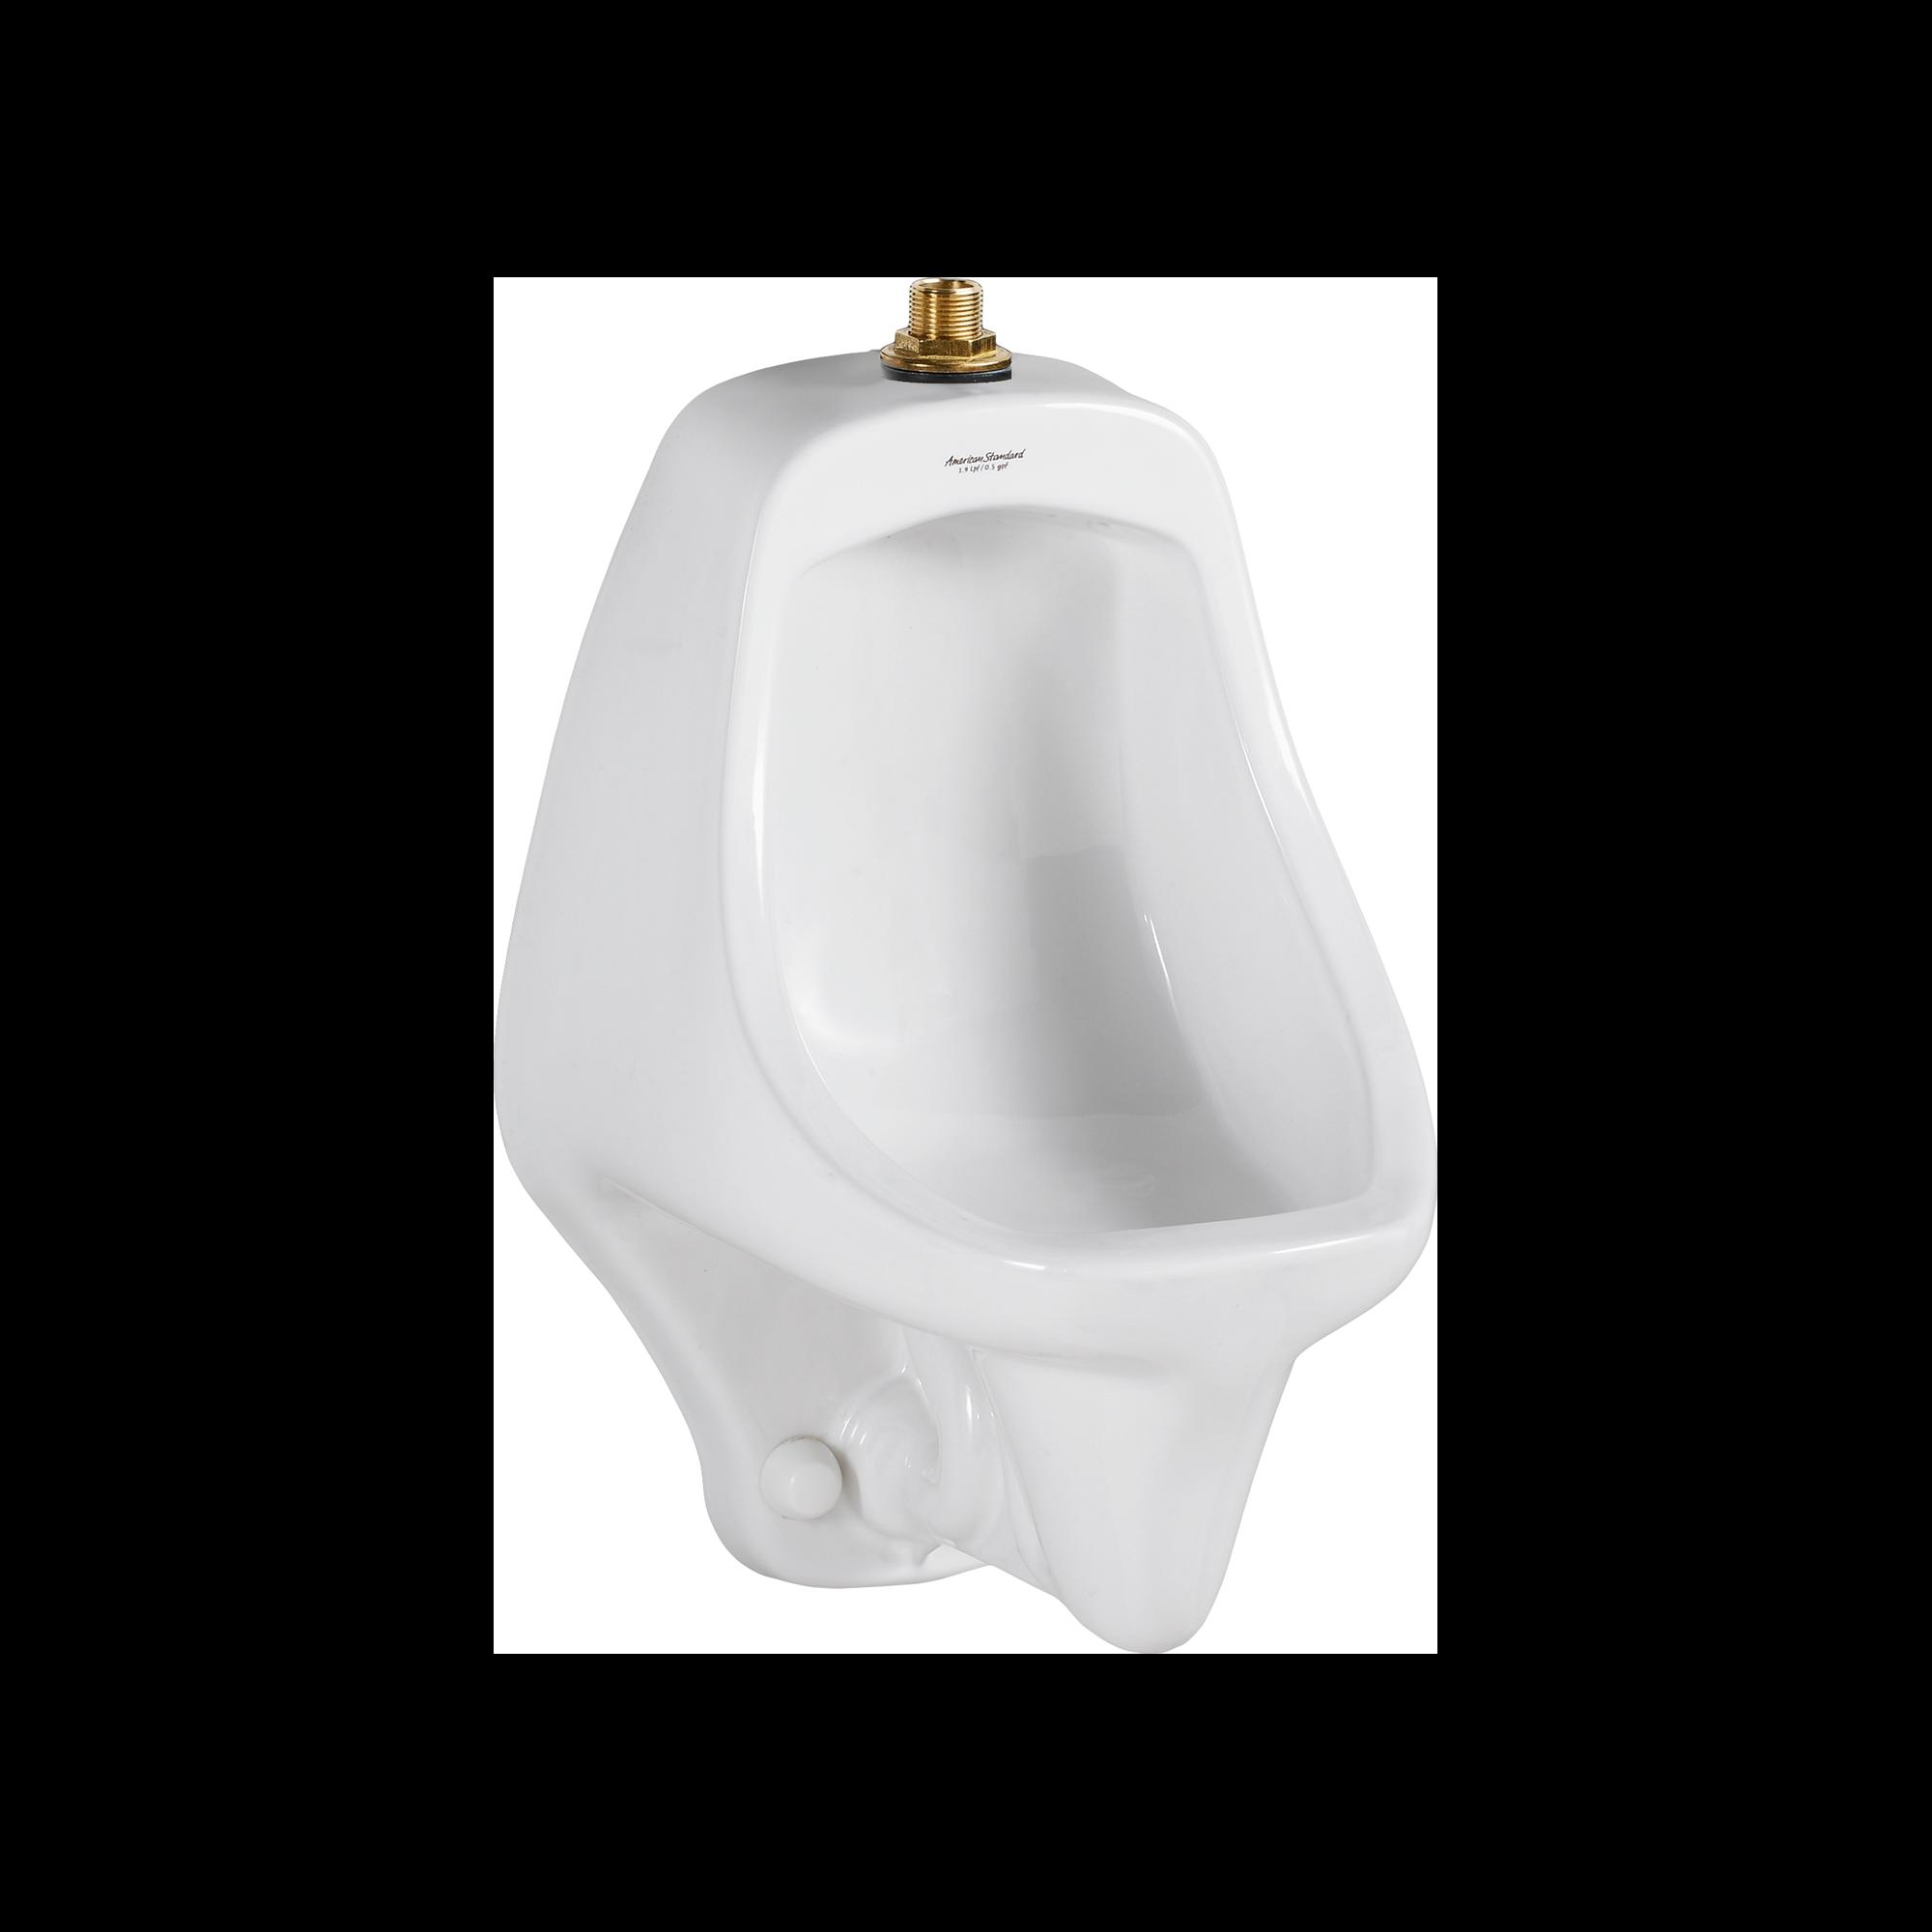 American Standard 6550001 02 Urinal White Urinals